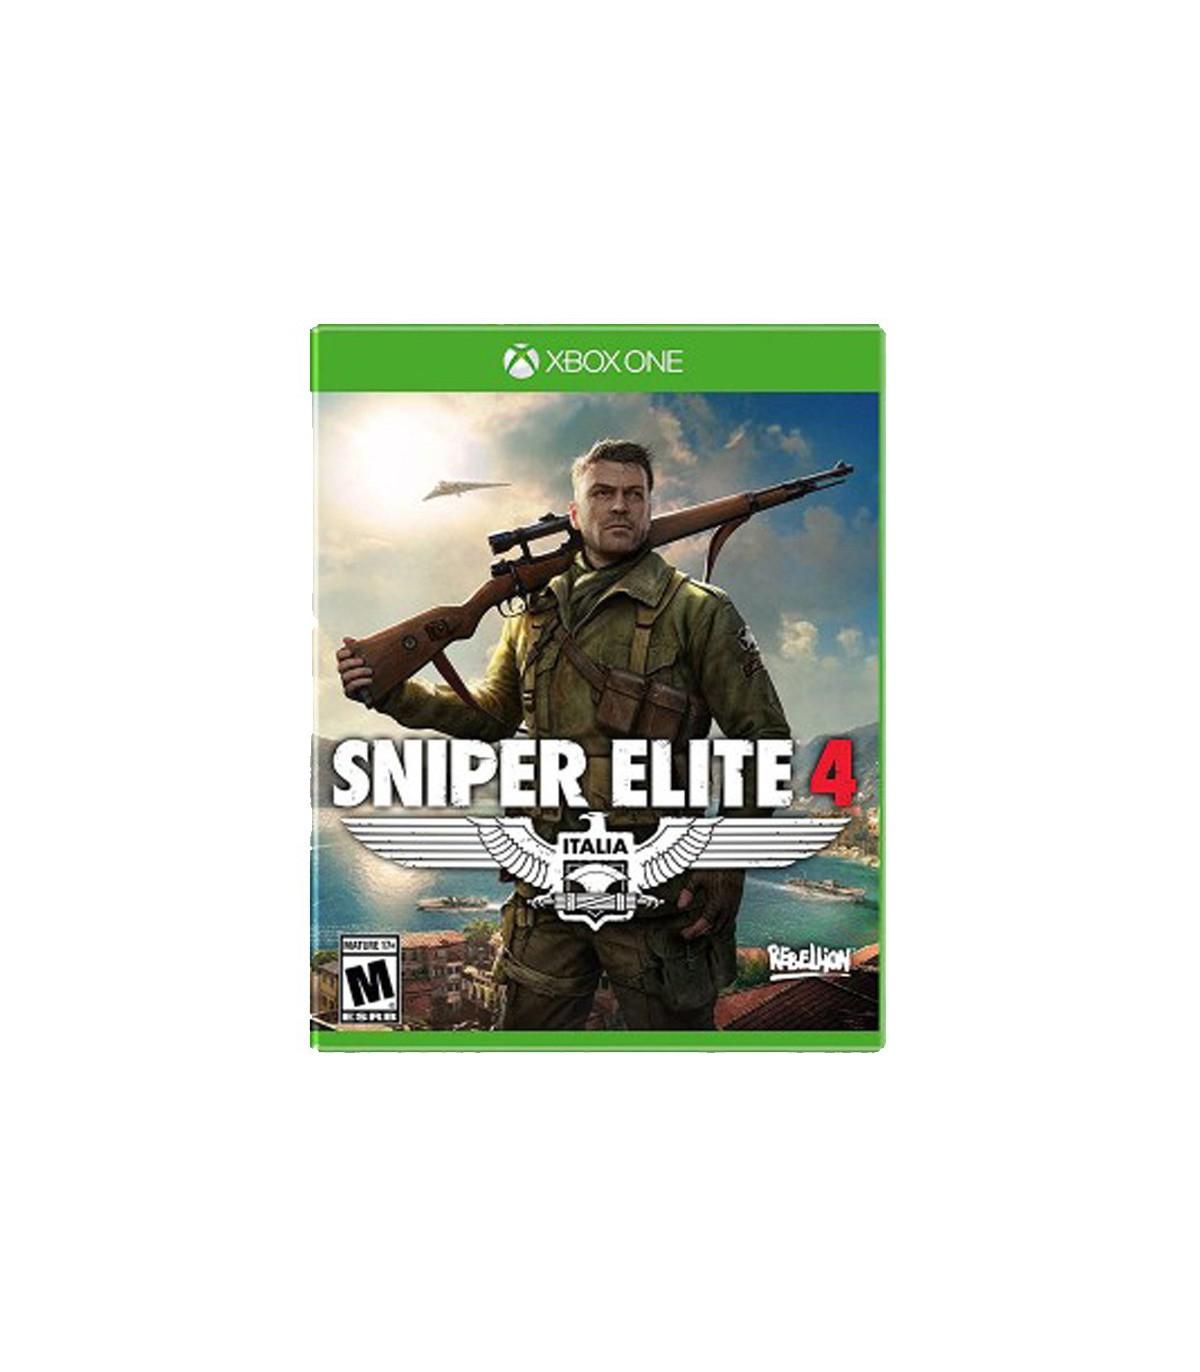 Sniper Elite 4 کارکرده - ایکس باکس وان